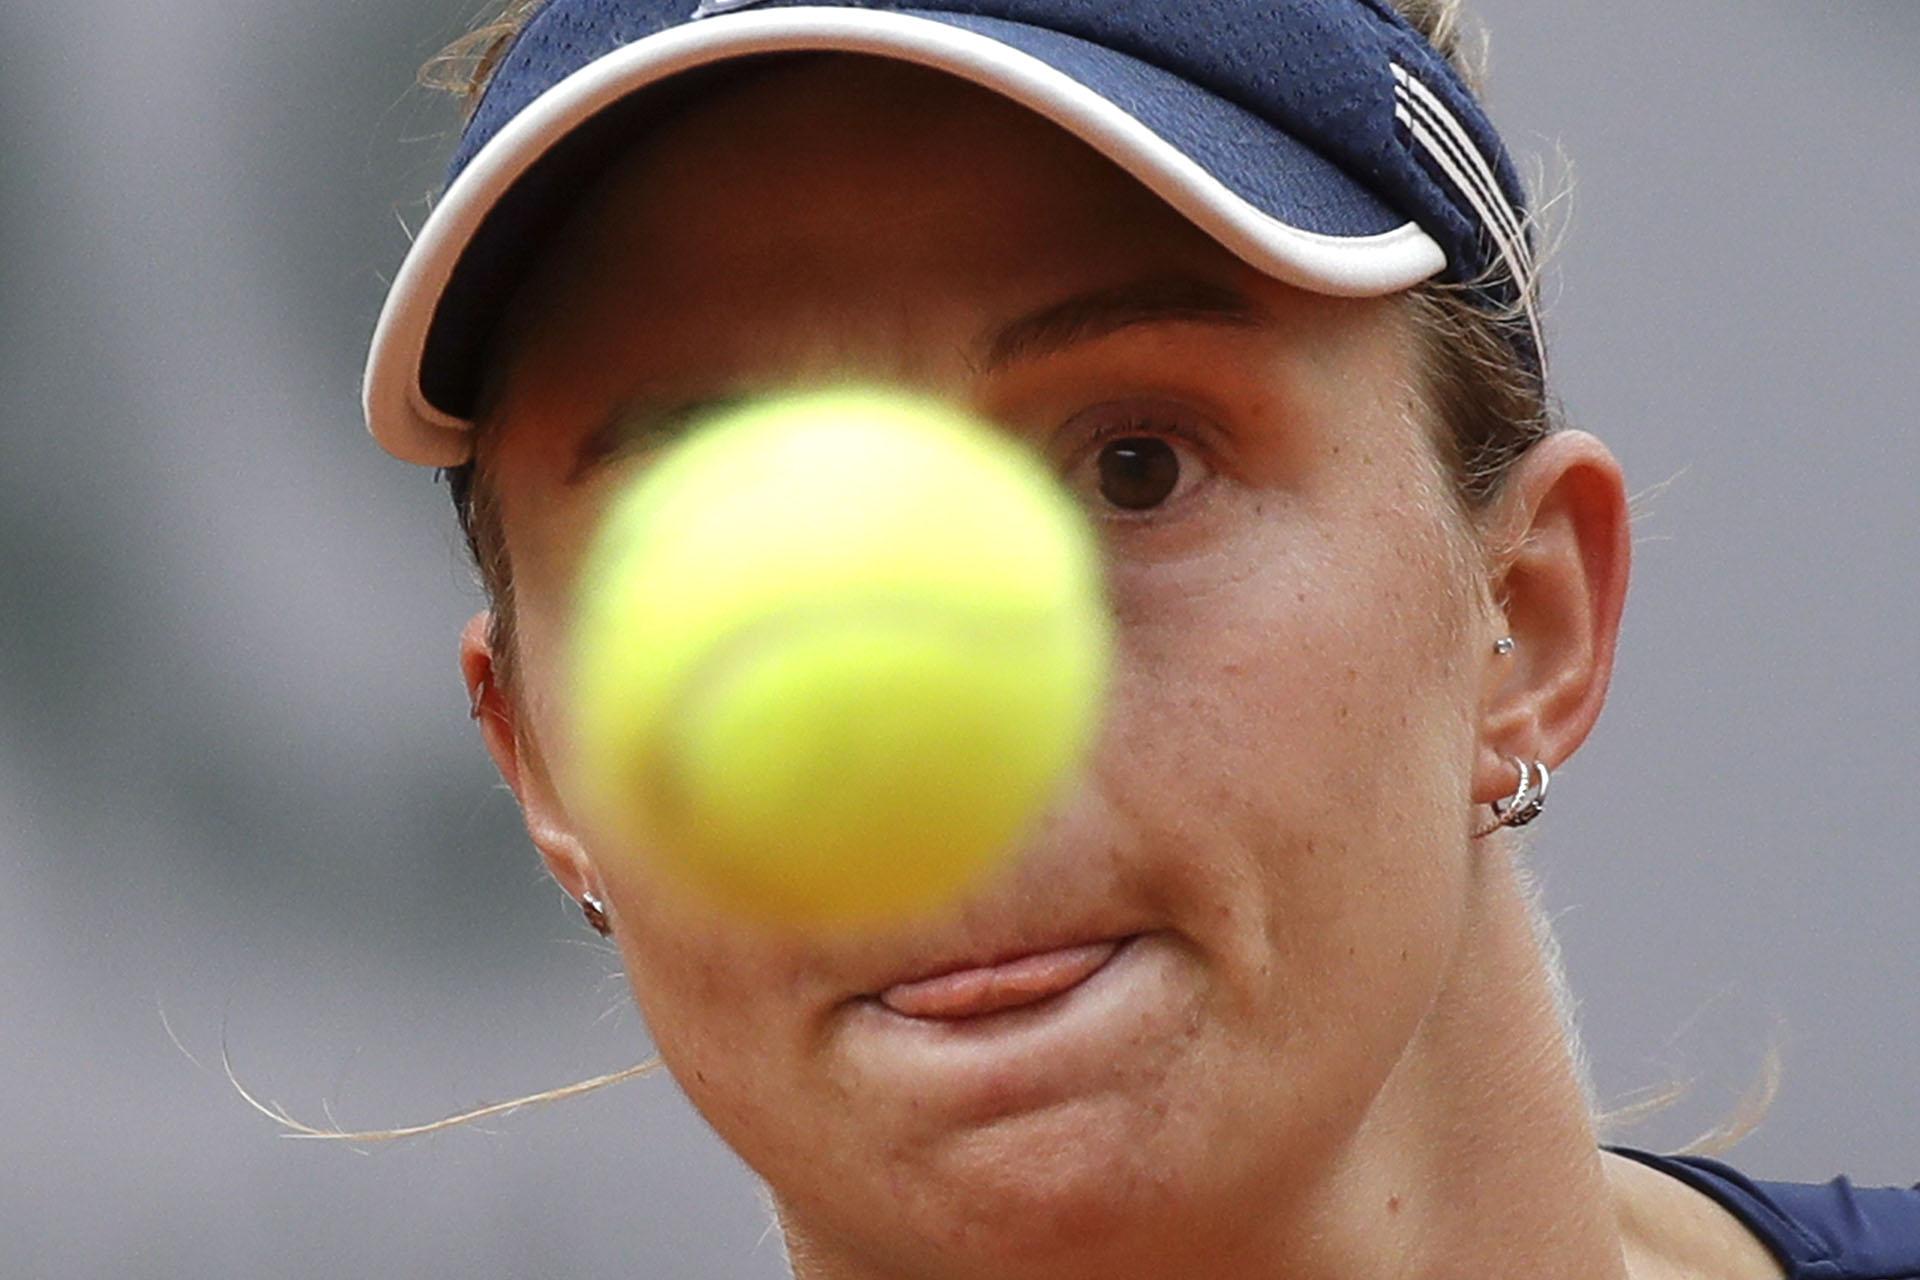 Ojos en la pelota para la argentina Podoroska (AP Photo/Alessandra Tarantino)